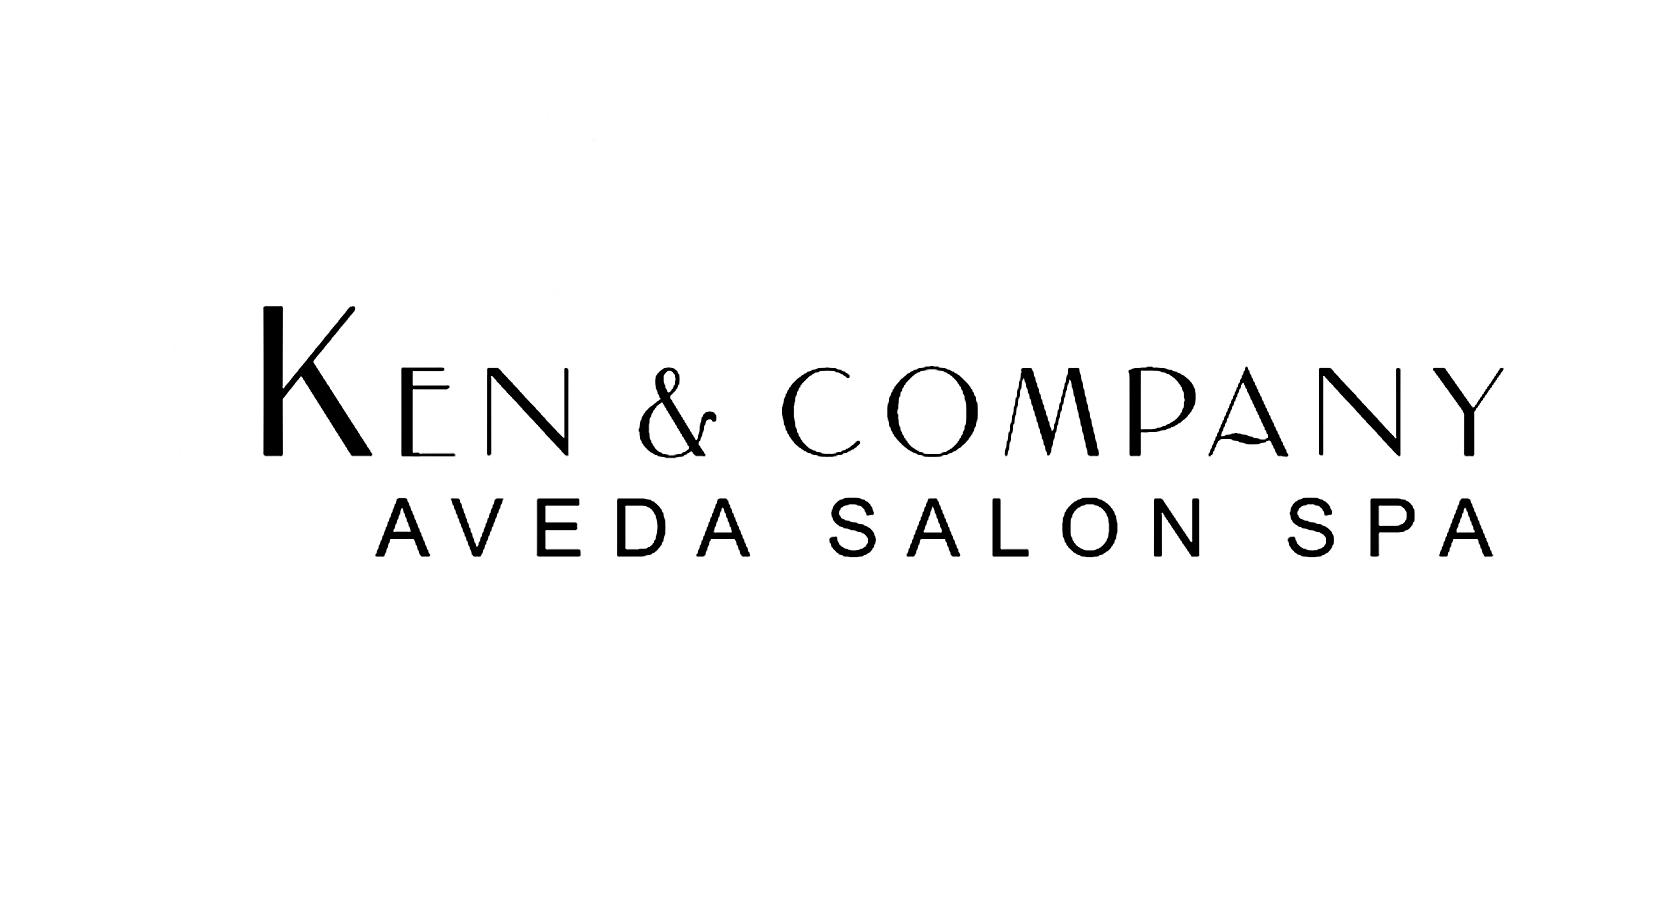 Ken & Company